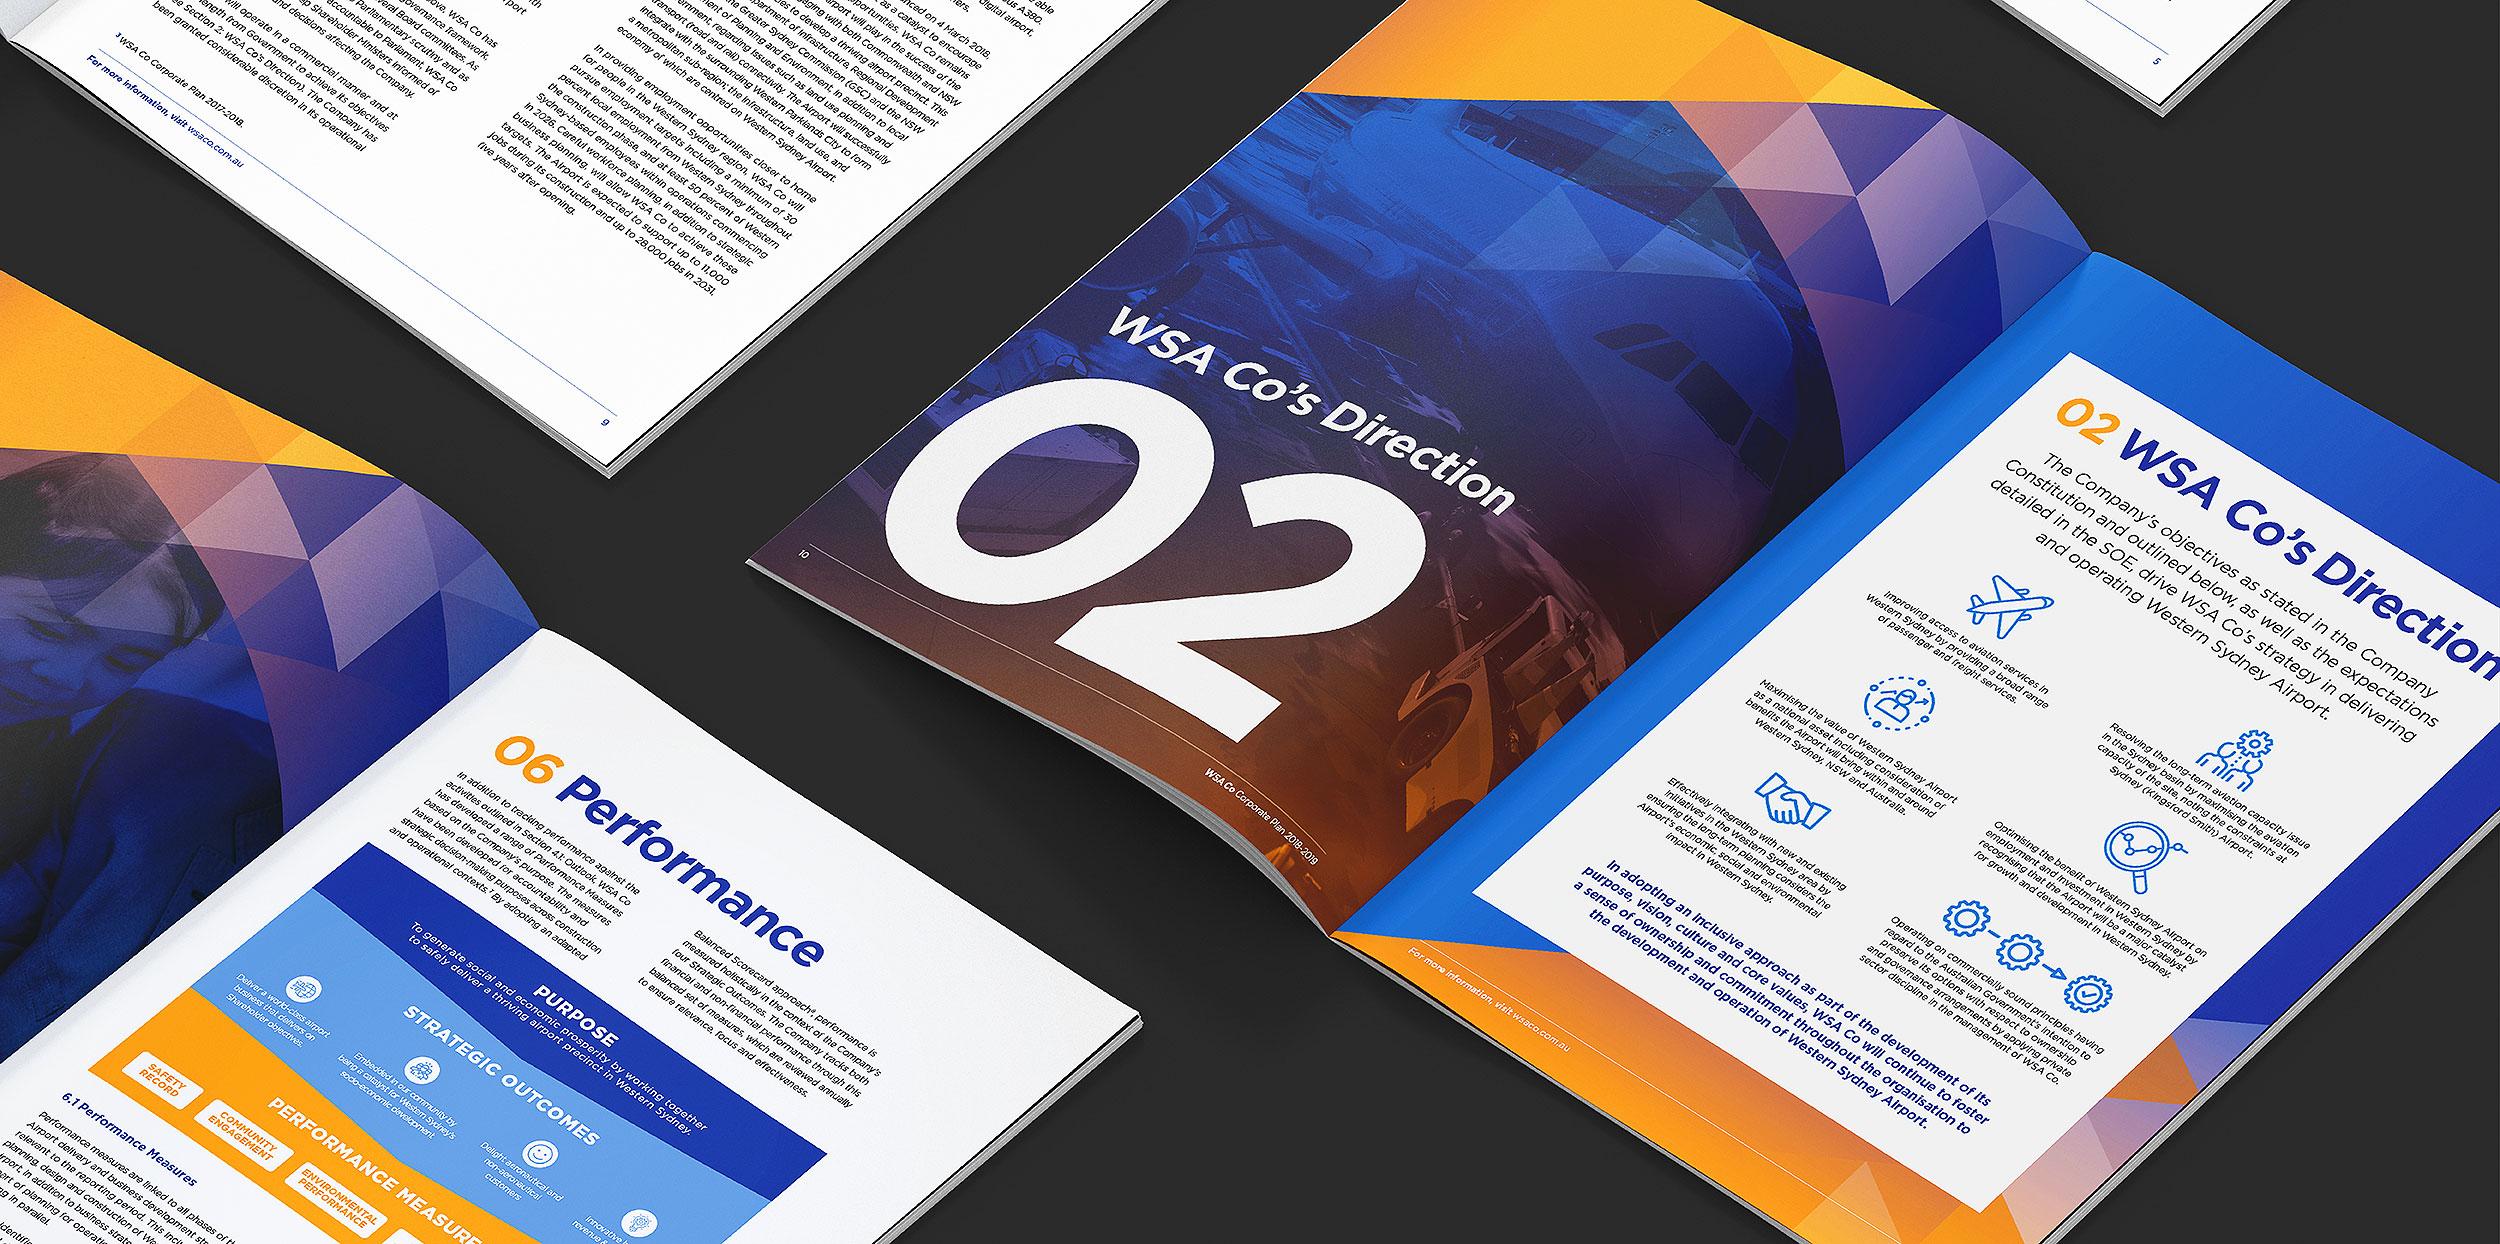 Website_Banners_Corporate6.jpg